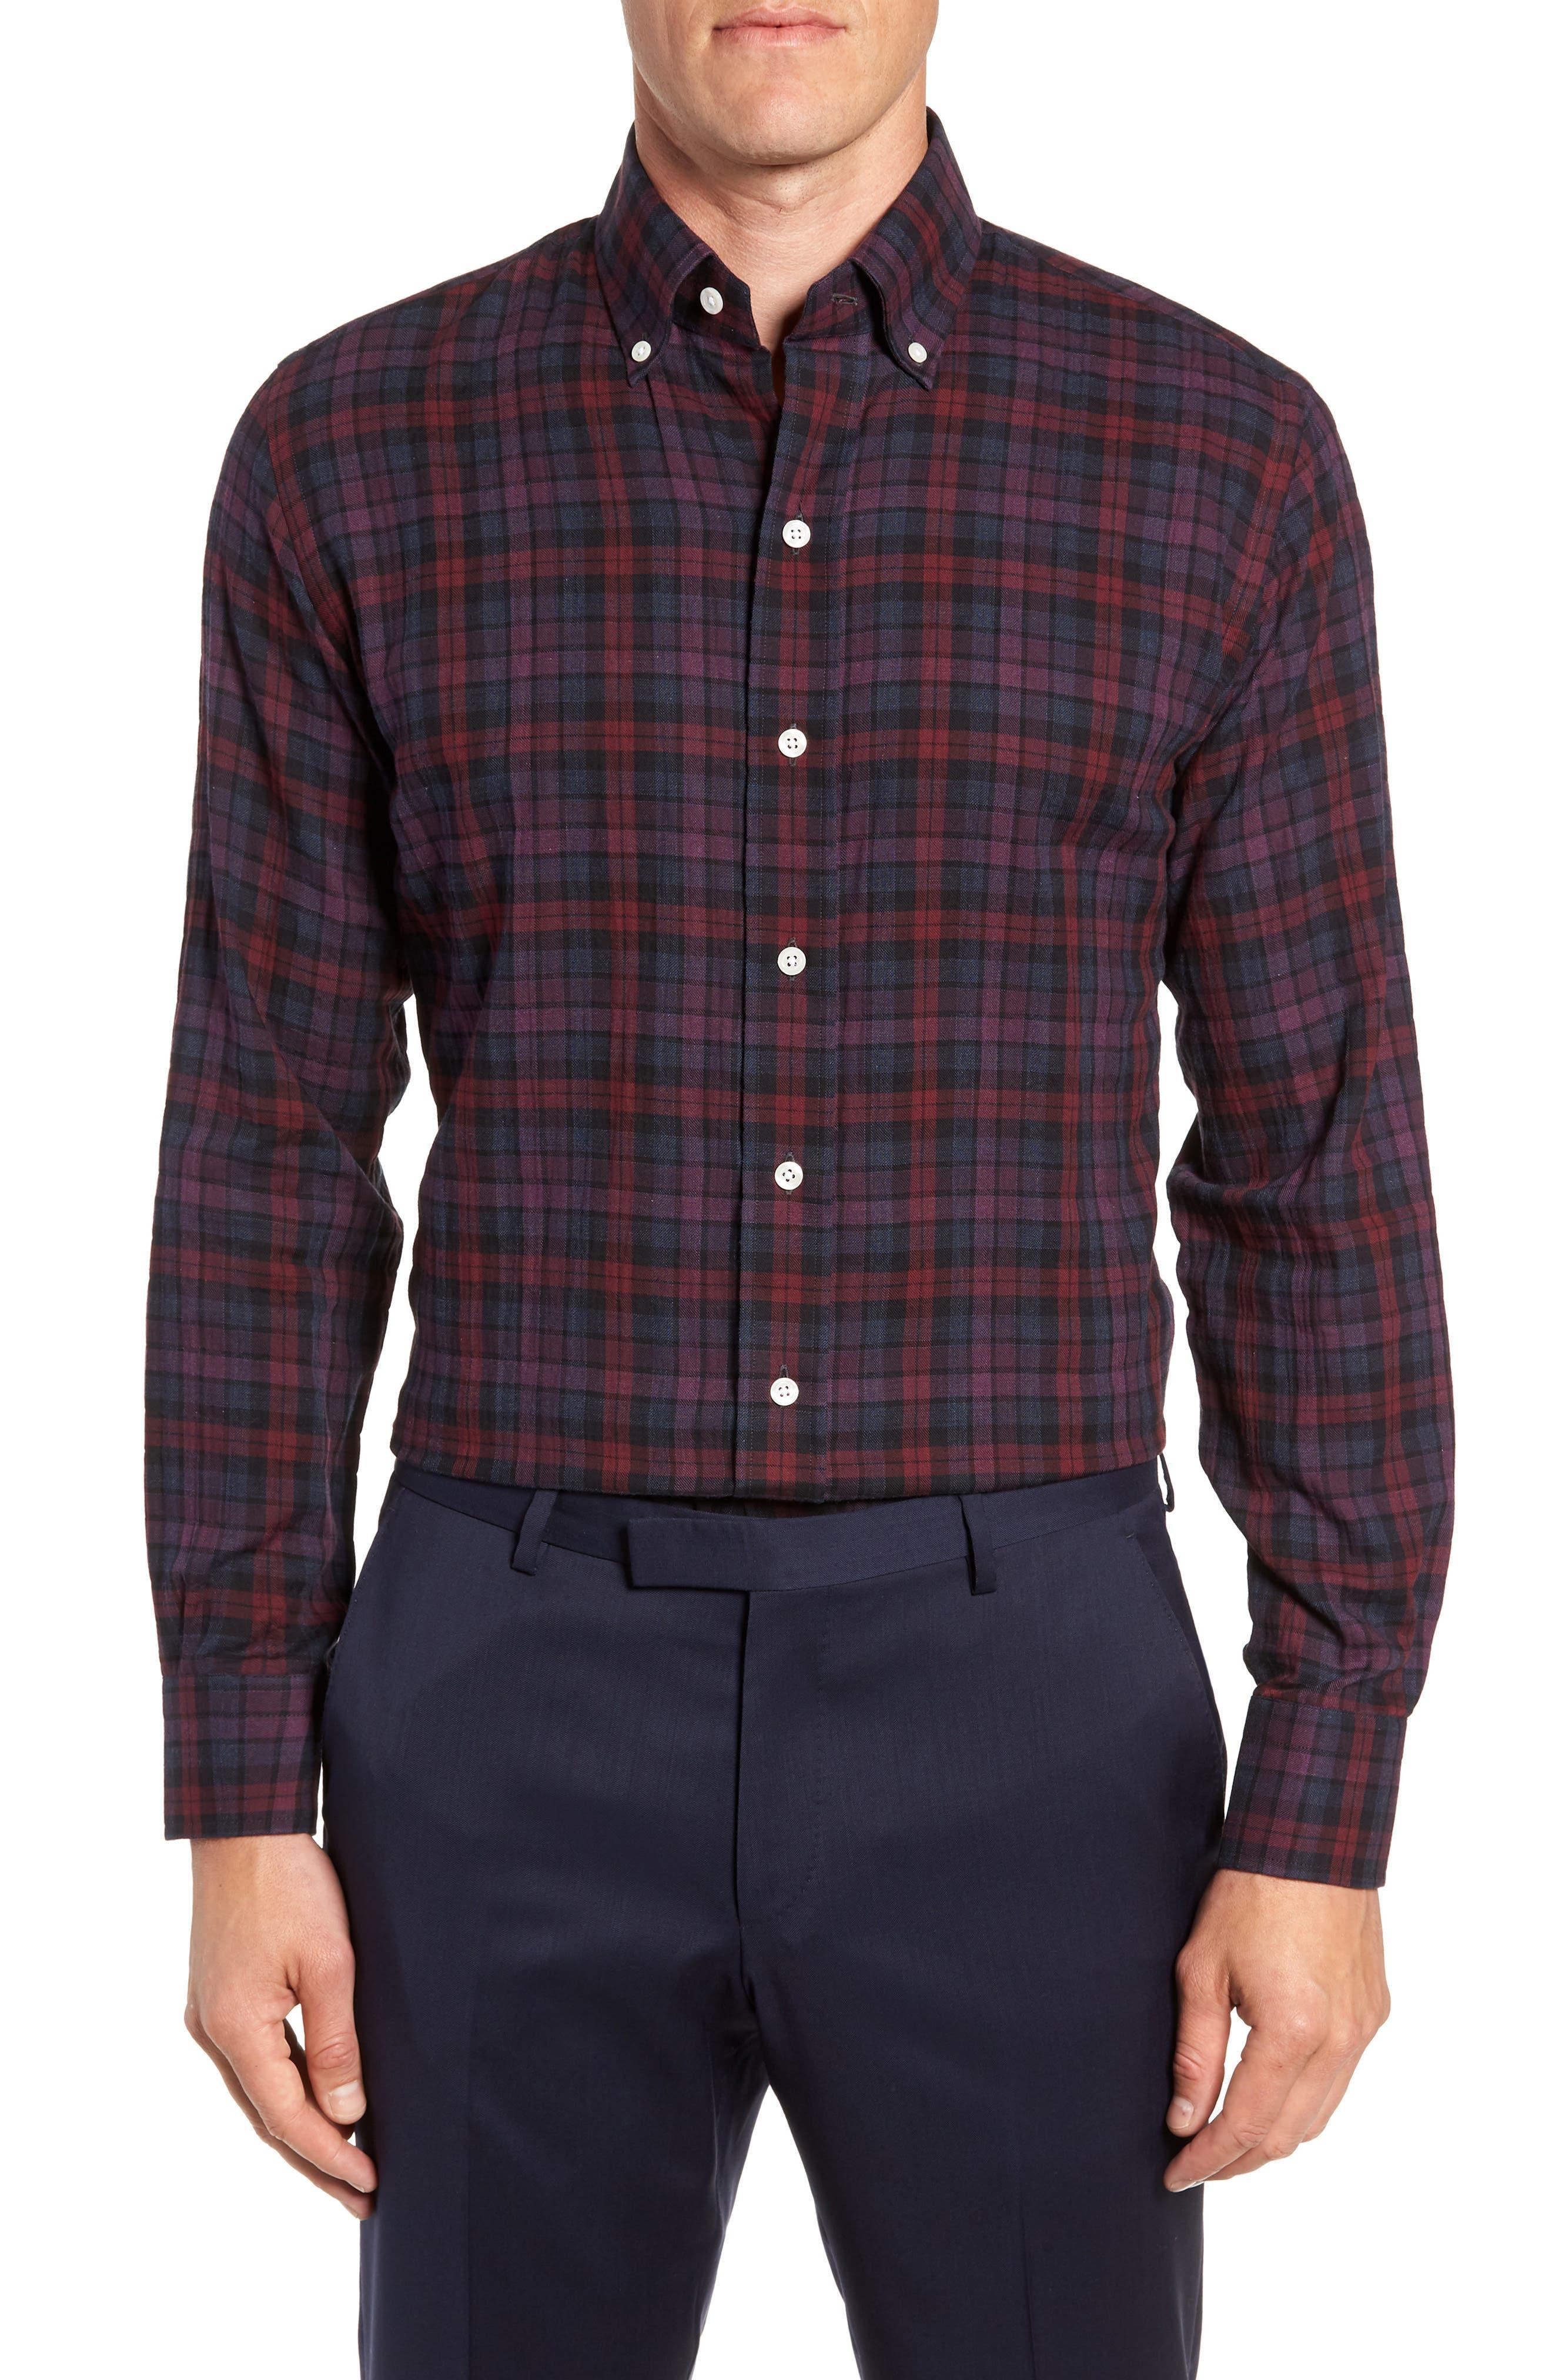 LEDBURY Torello Trim Fit Plaid Dress Shirt in Plum